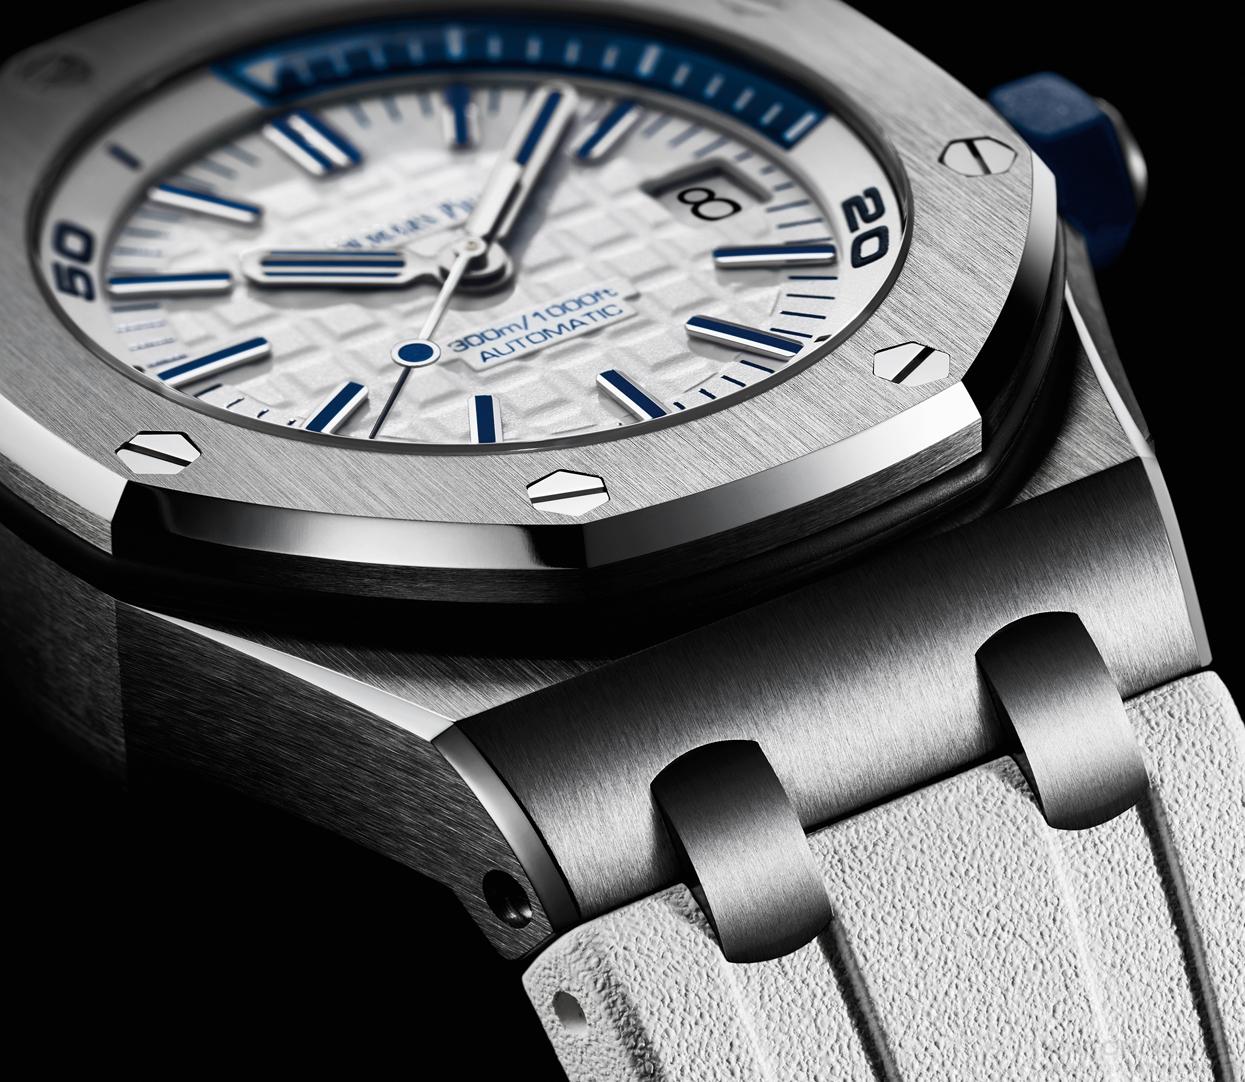 【2017日內瓦錶展報導】Audemars Piguet Royal Oak Offshore Diver皇家橡樹離岸型彩色潛水錶